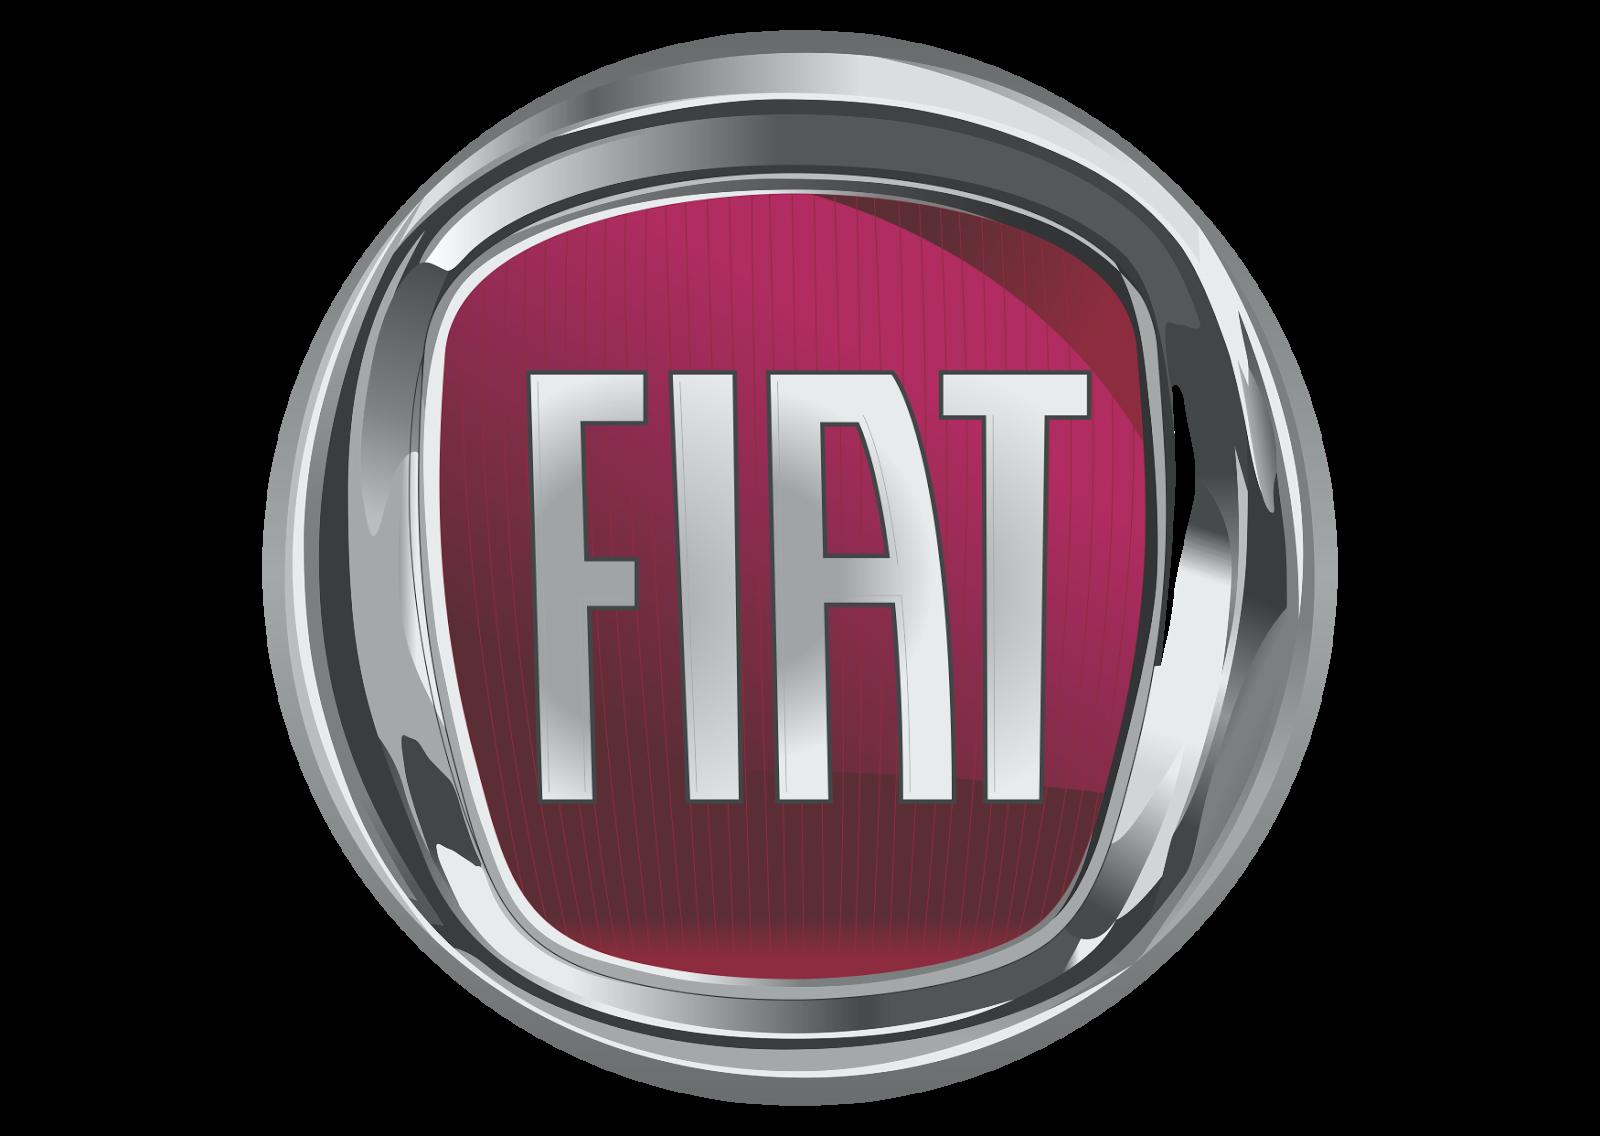 Fiat Logo Vector Fiat Logo Car Brands Logos Car Logos